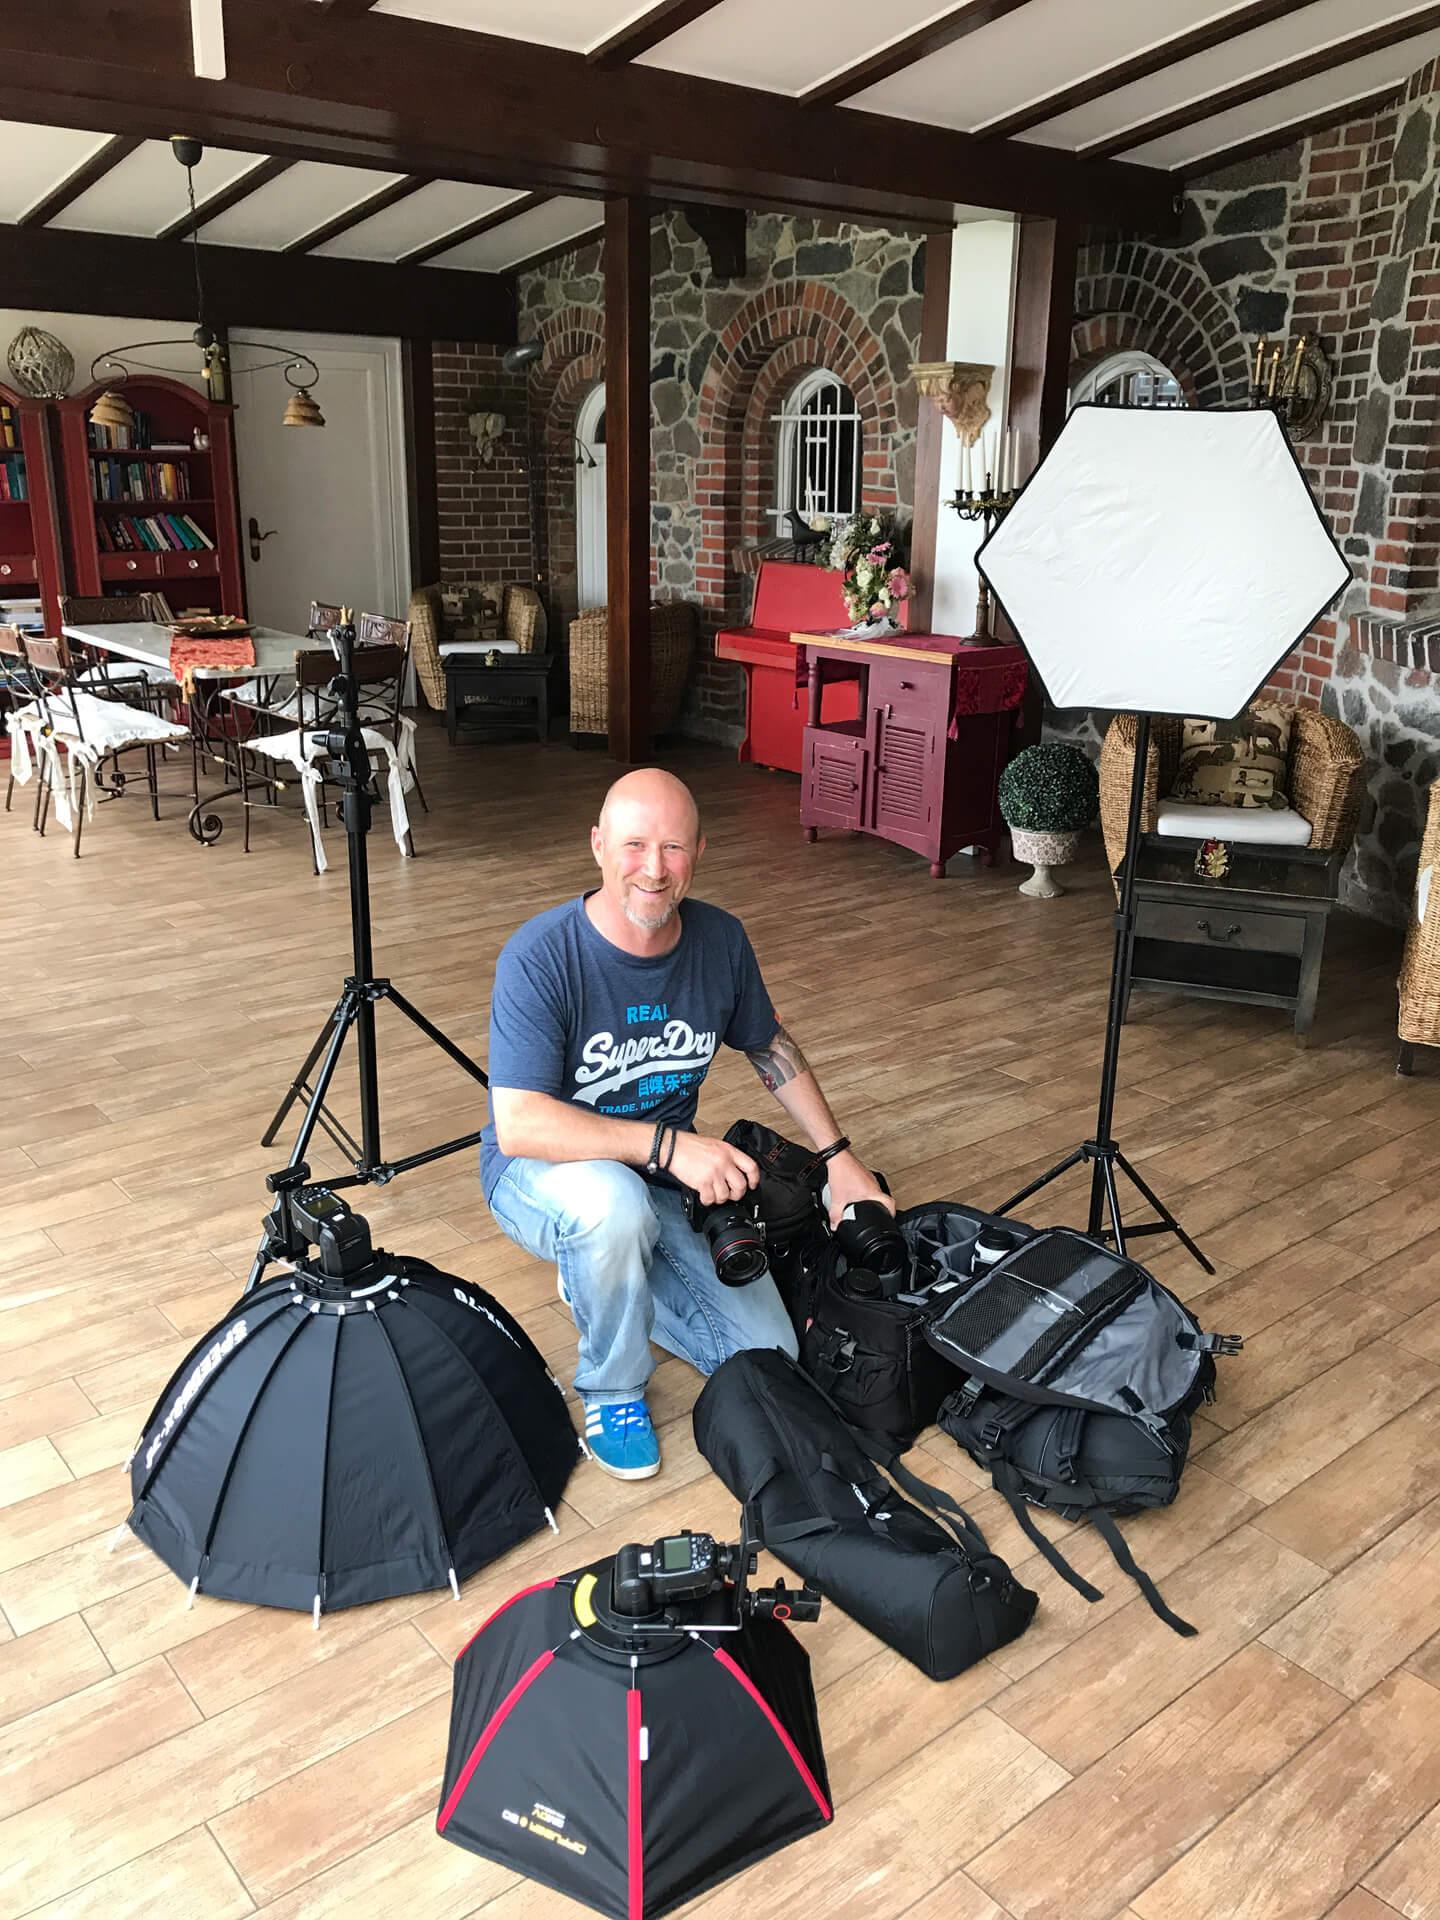 Portraitfotograf Florian Läufer bei der Arbeit